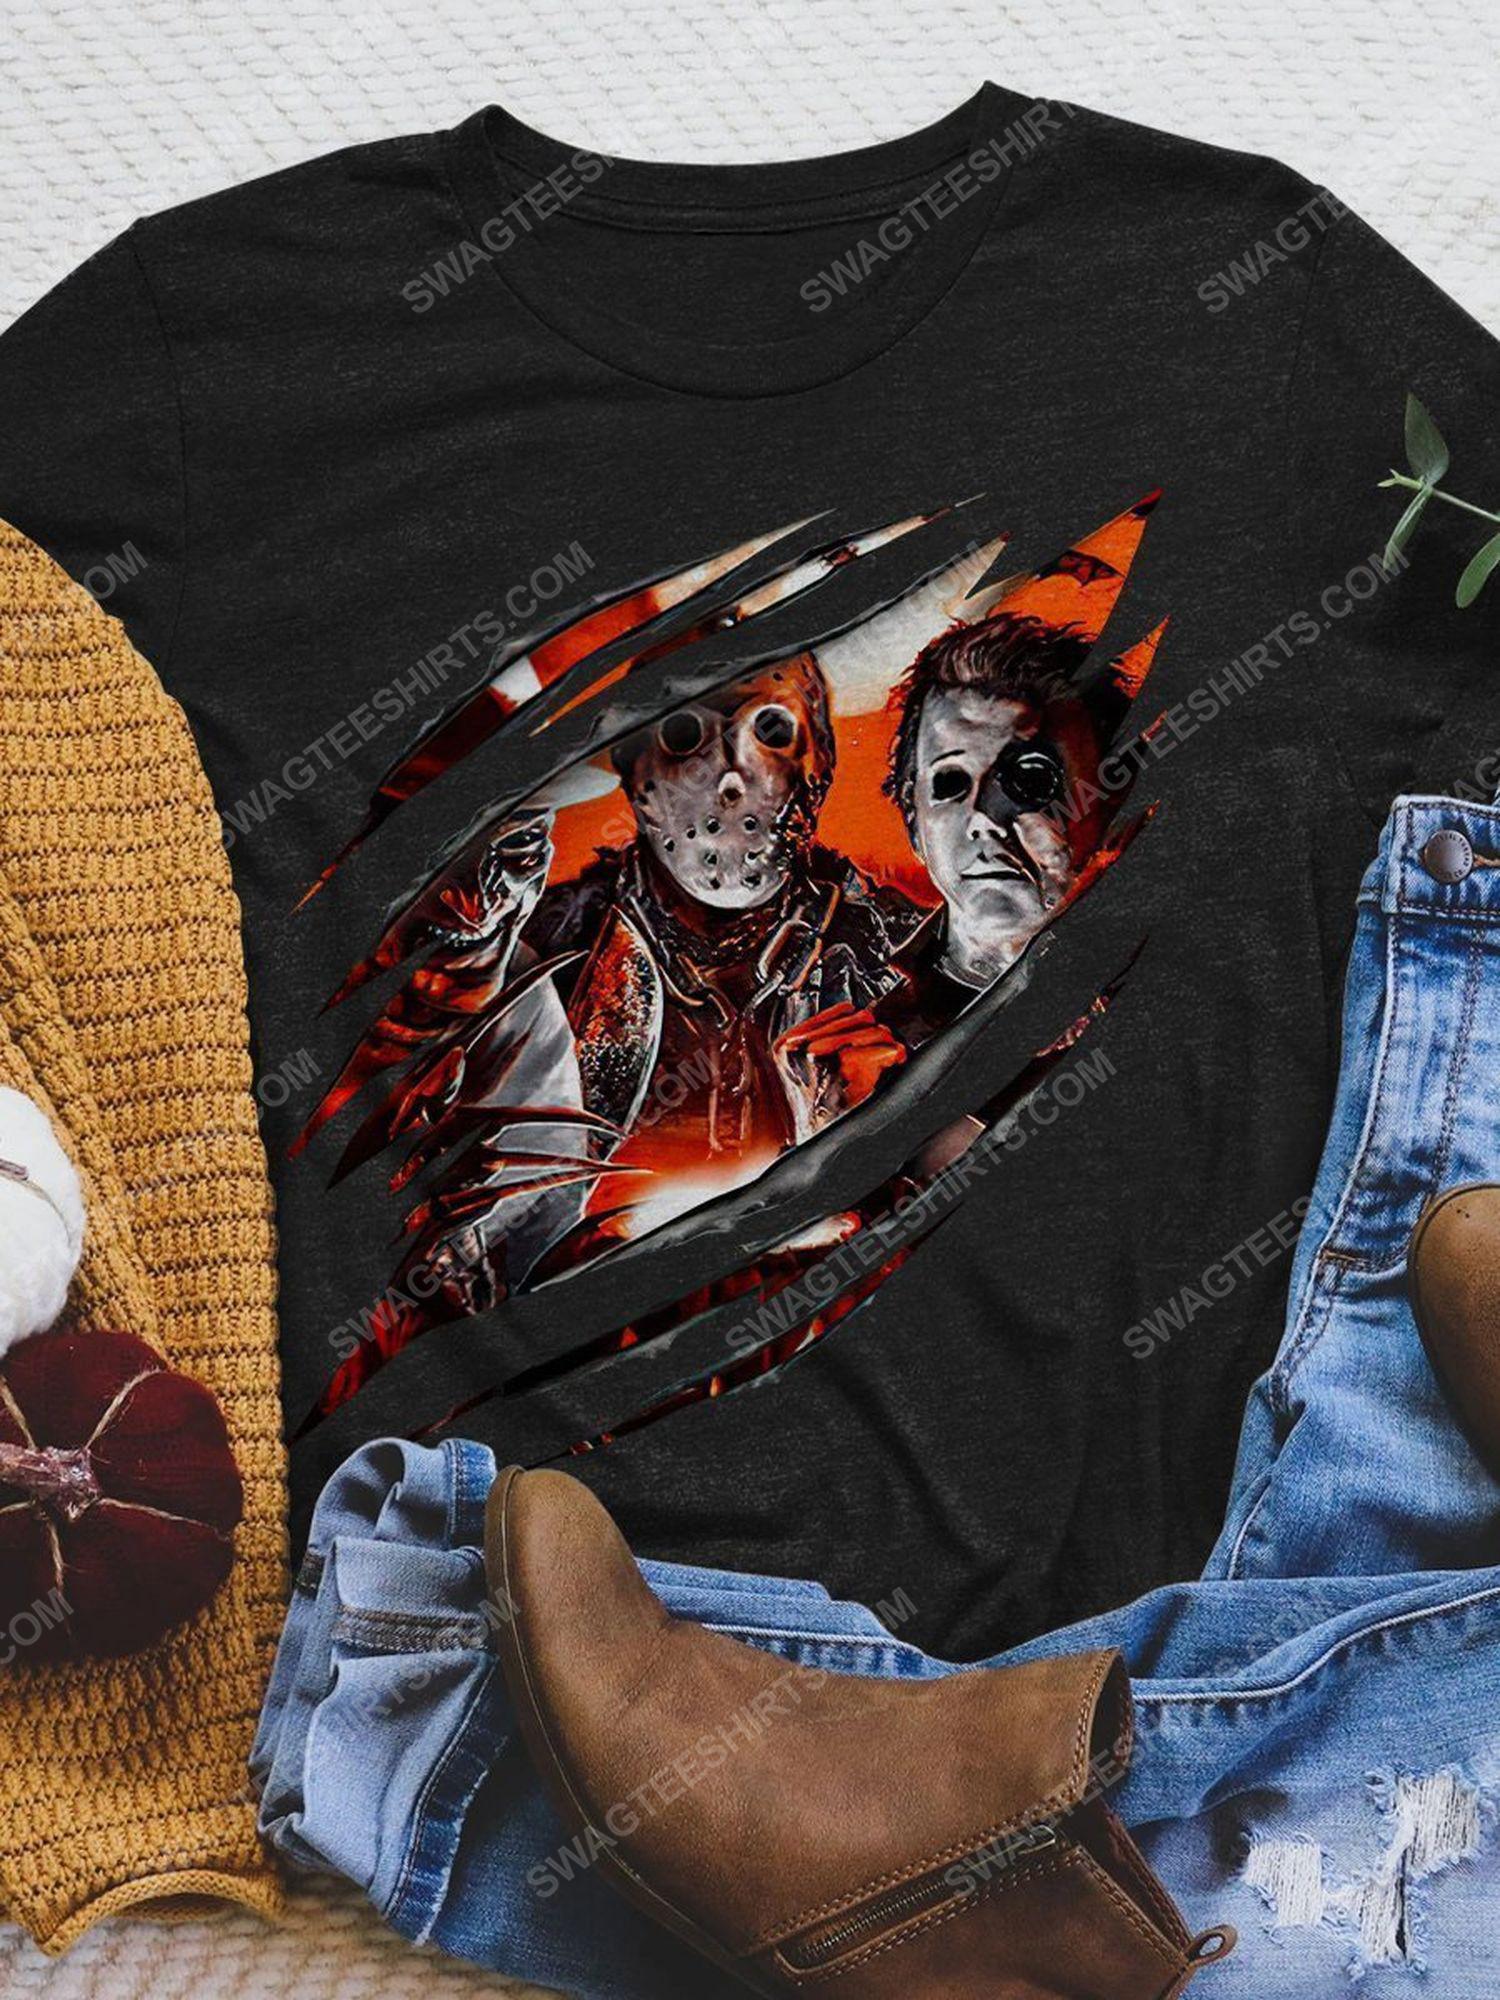 Halloween michael myers jason voorhees and freddy krueger shirt 1 - Copy (2)